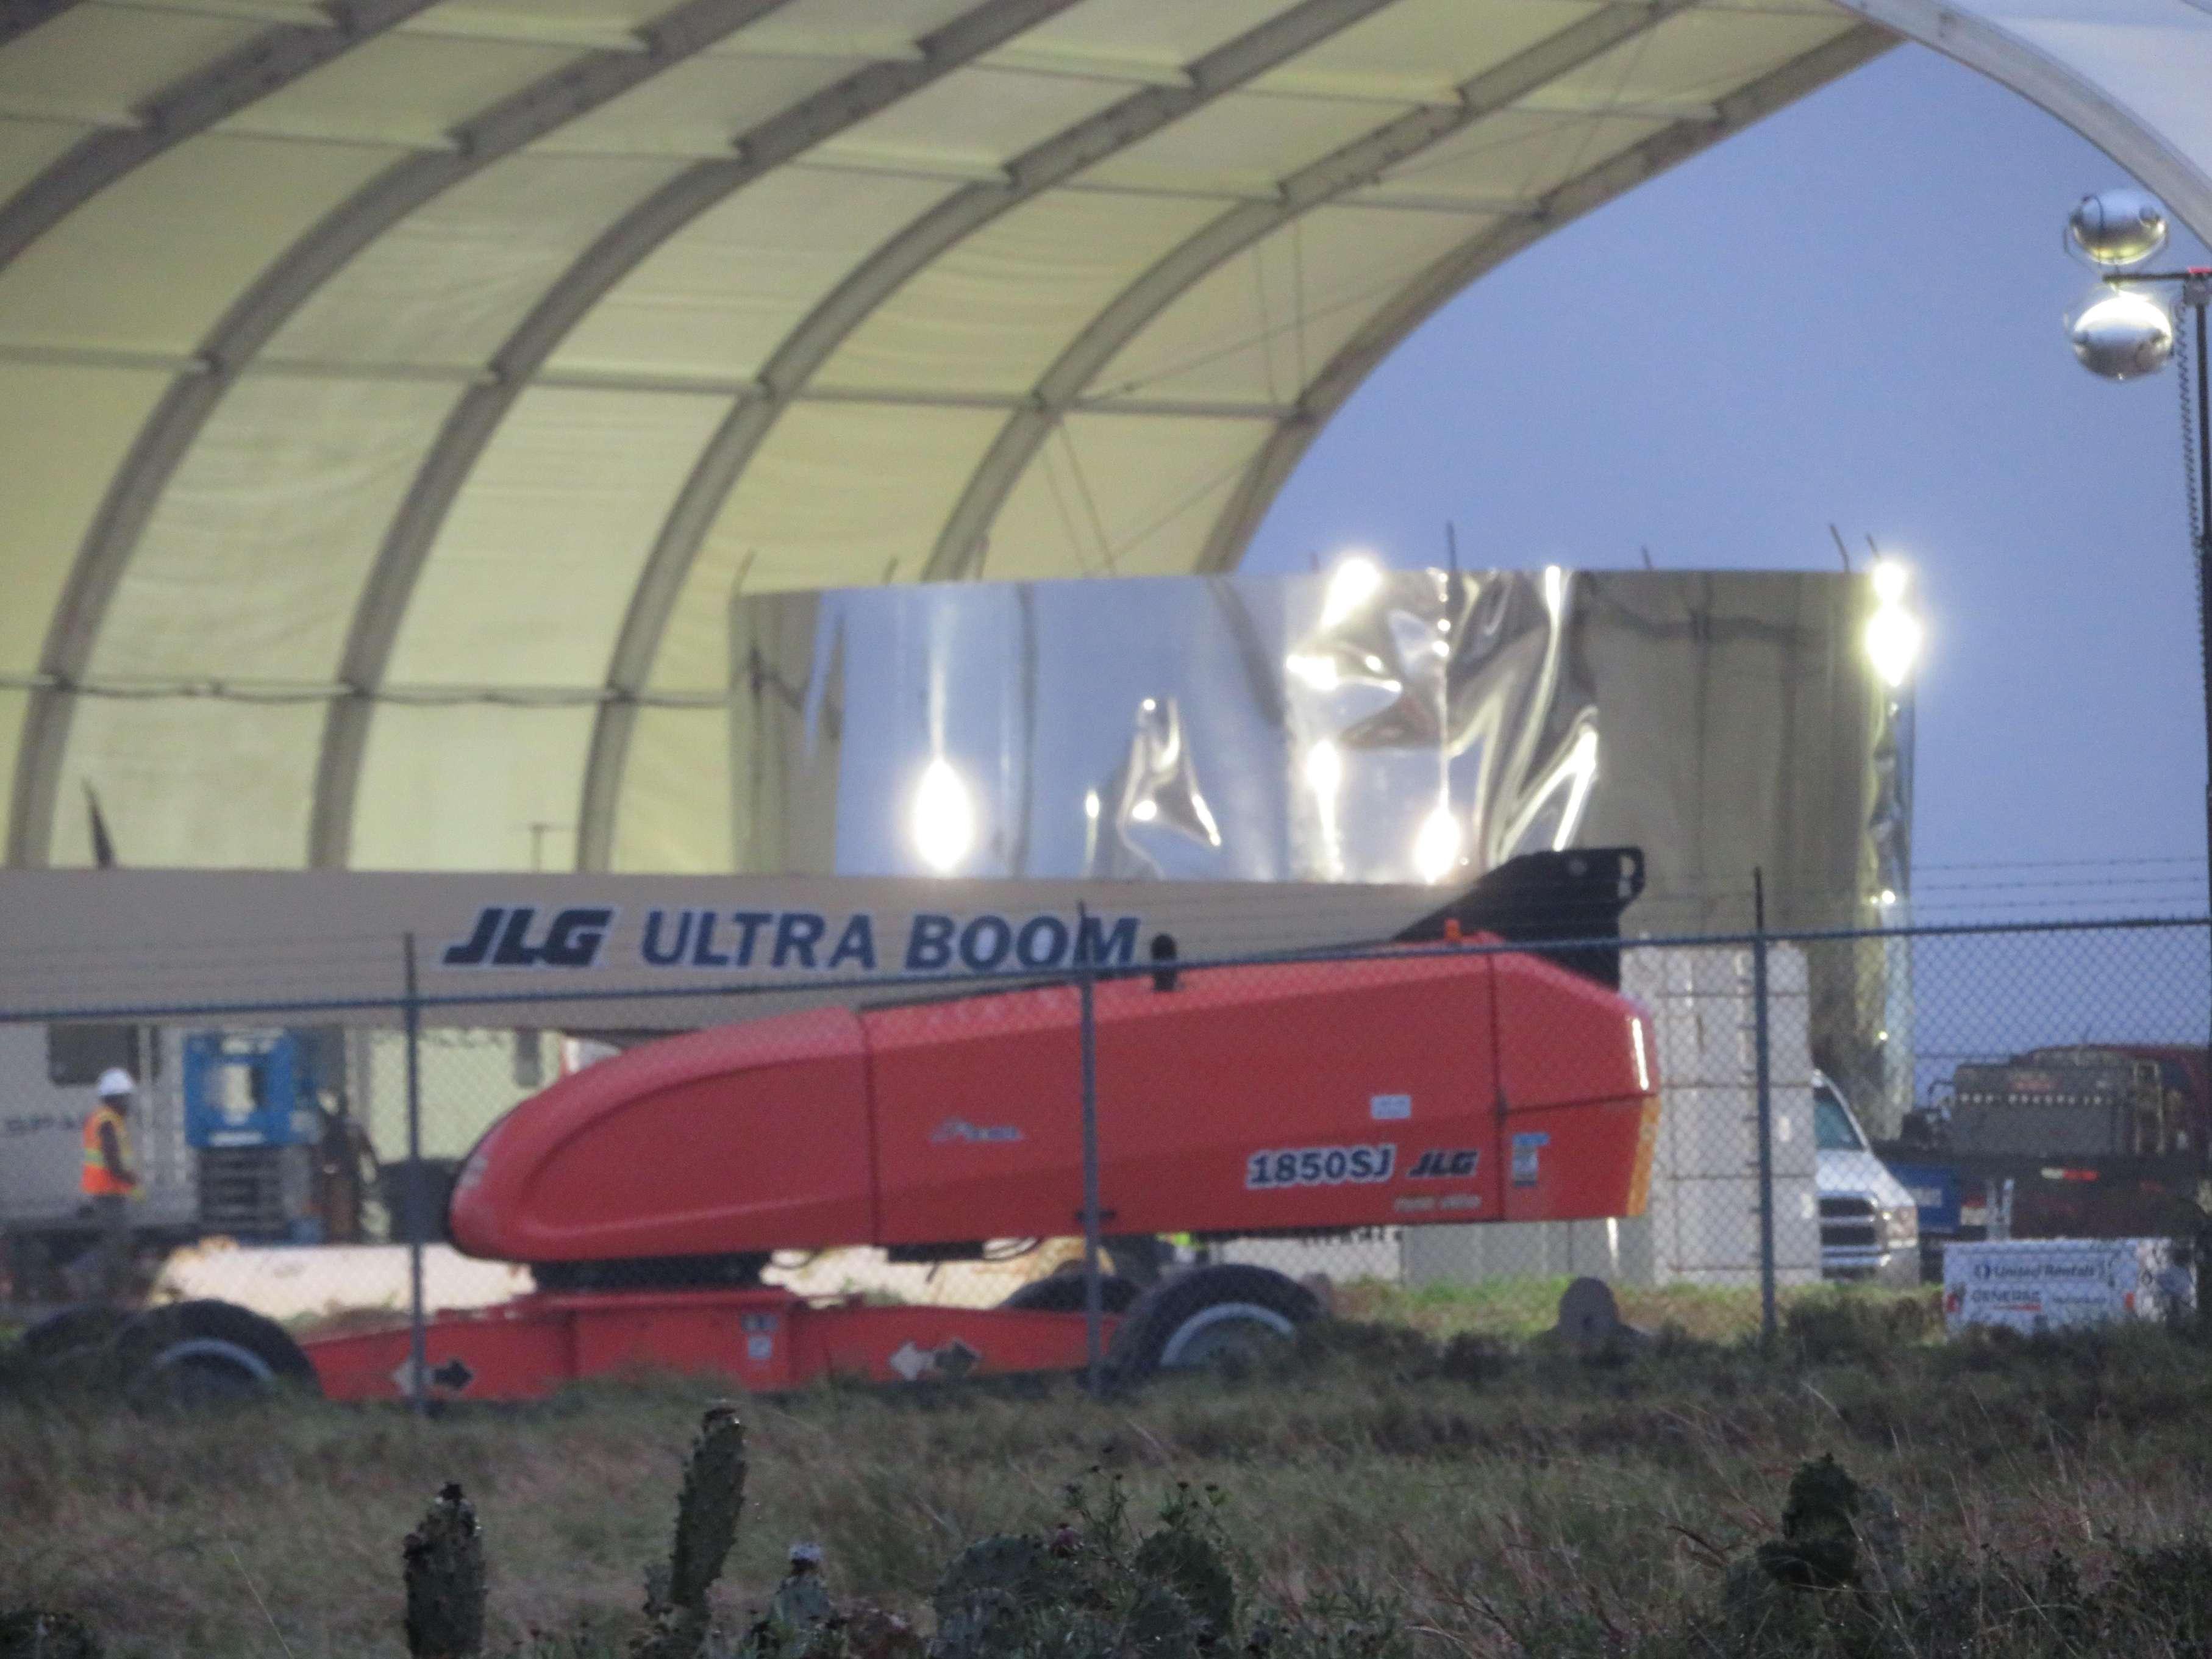 Boca Chica Starship progress 123118 (NSF – bocachicagal) 3(c)